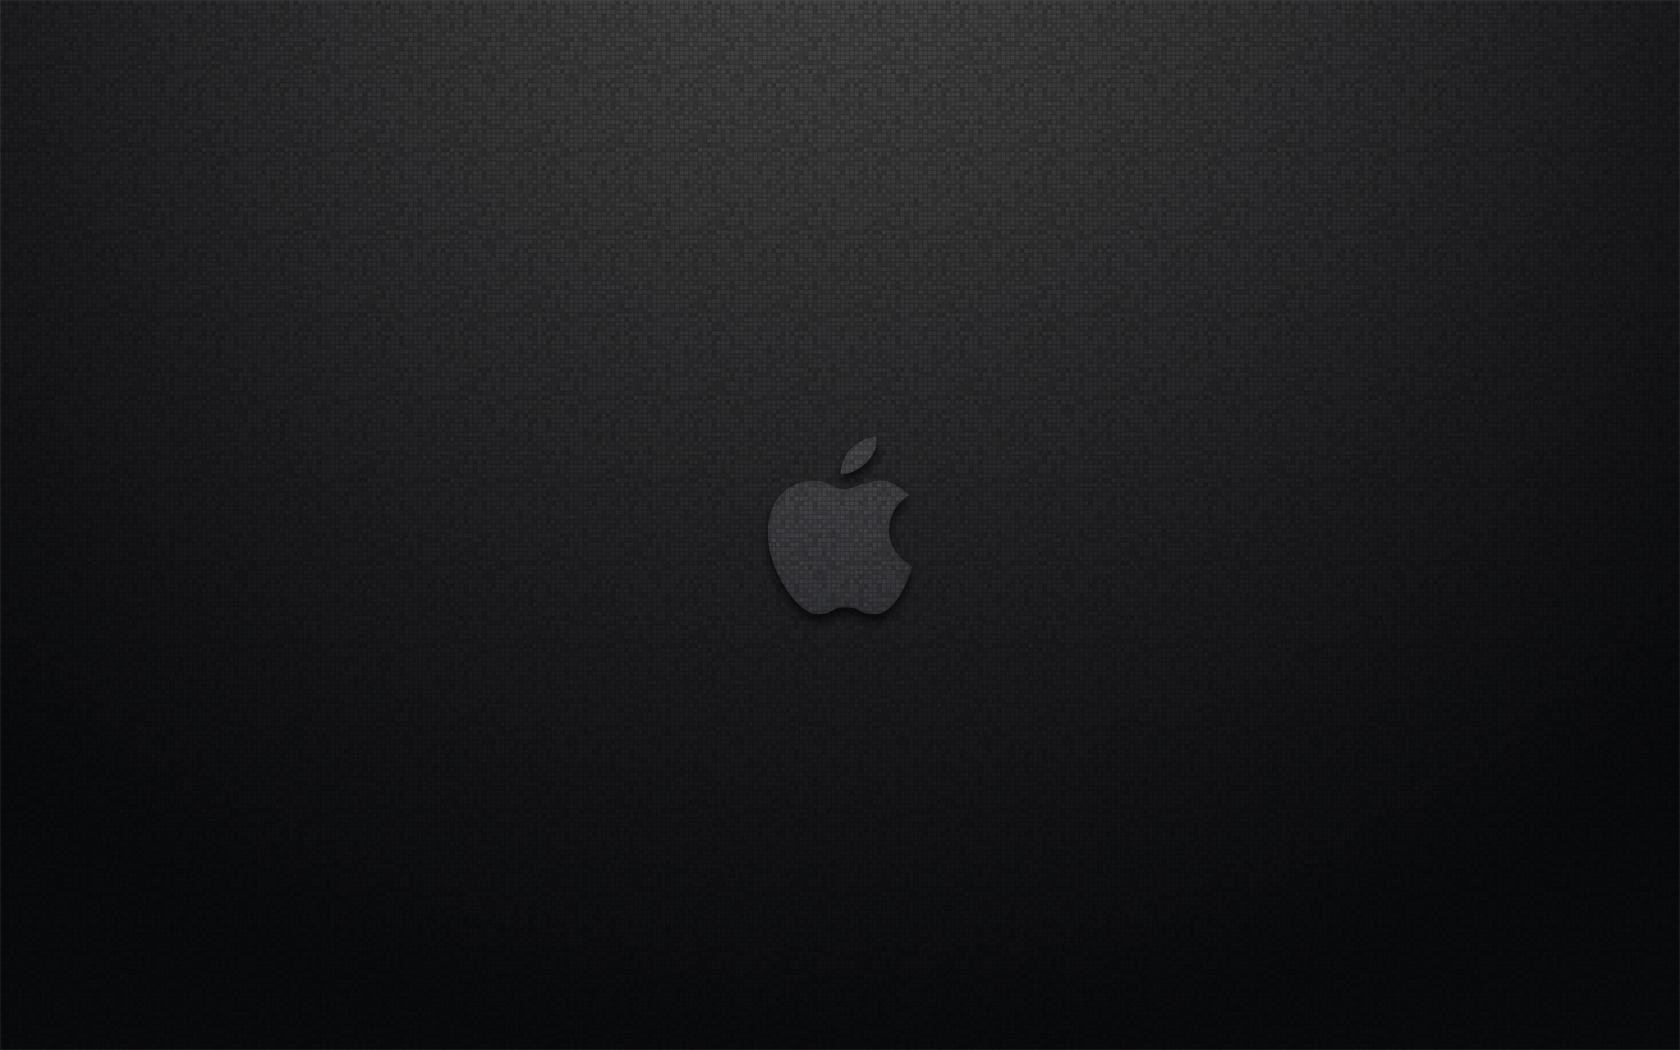 New Apple Wallpaper 1680x1050